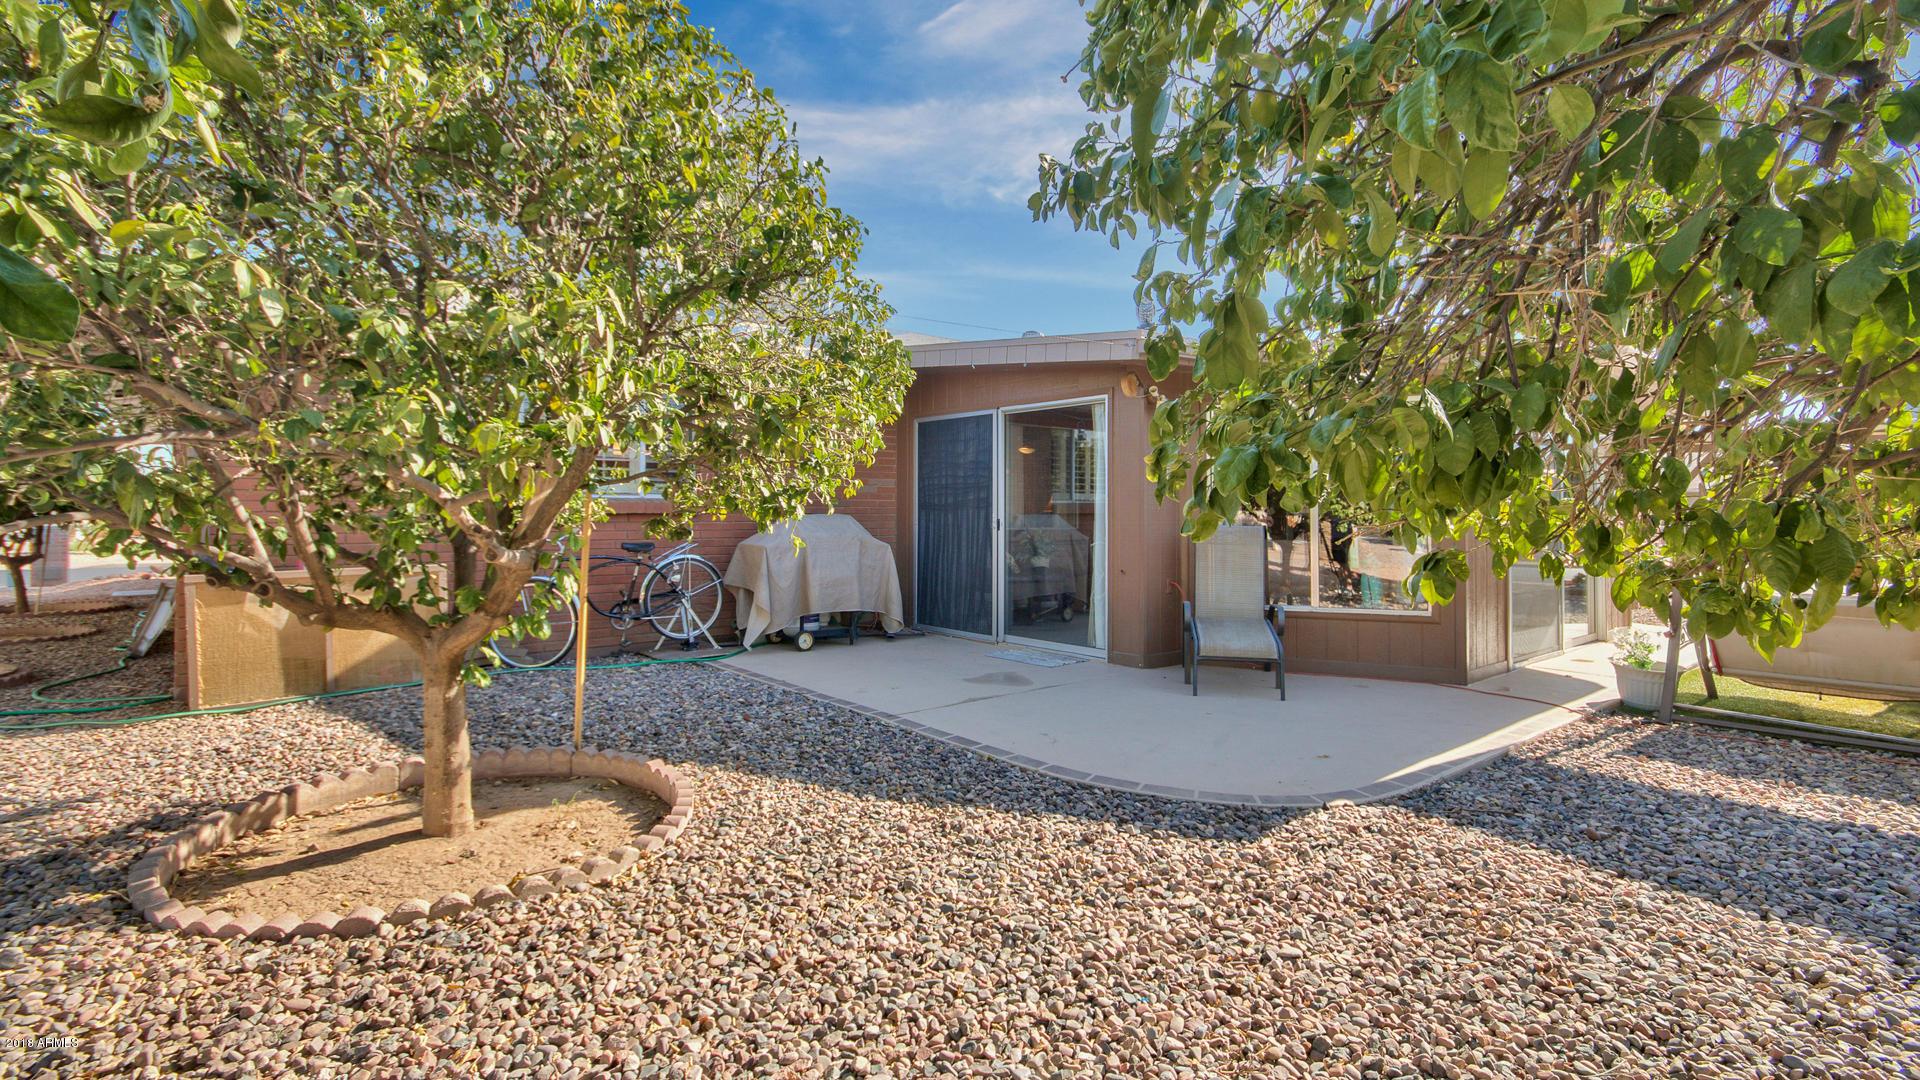 MLS 5823179 4424 E DELTA Avenue, Mesa, AZ 85206 Mesa AZ Sunland Village